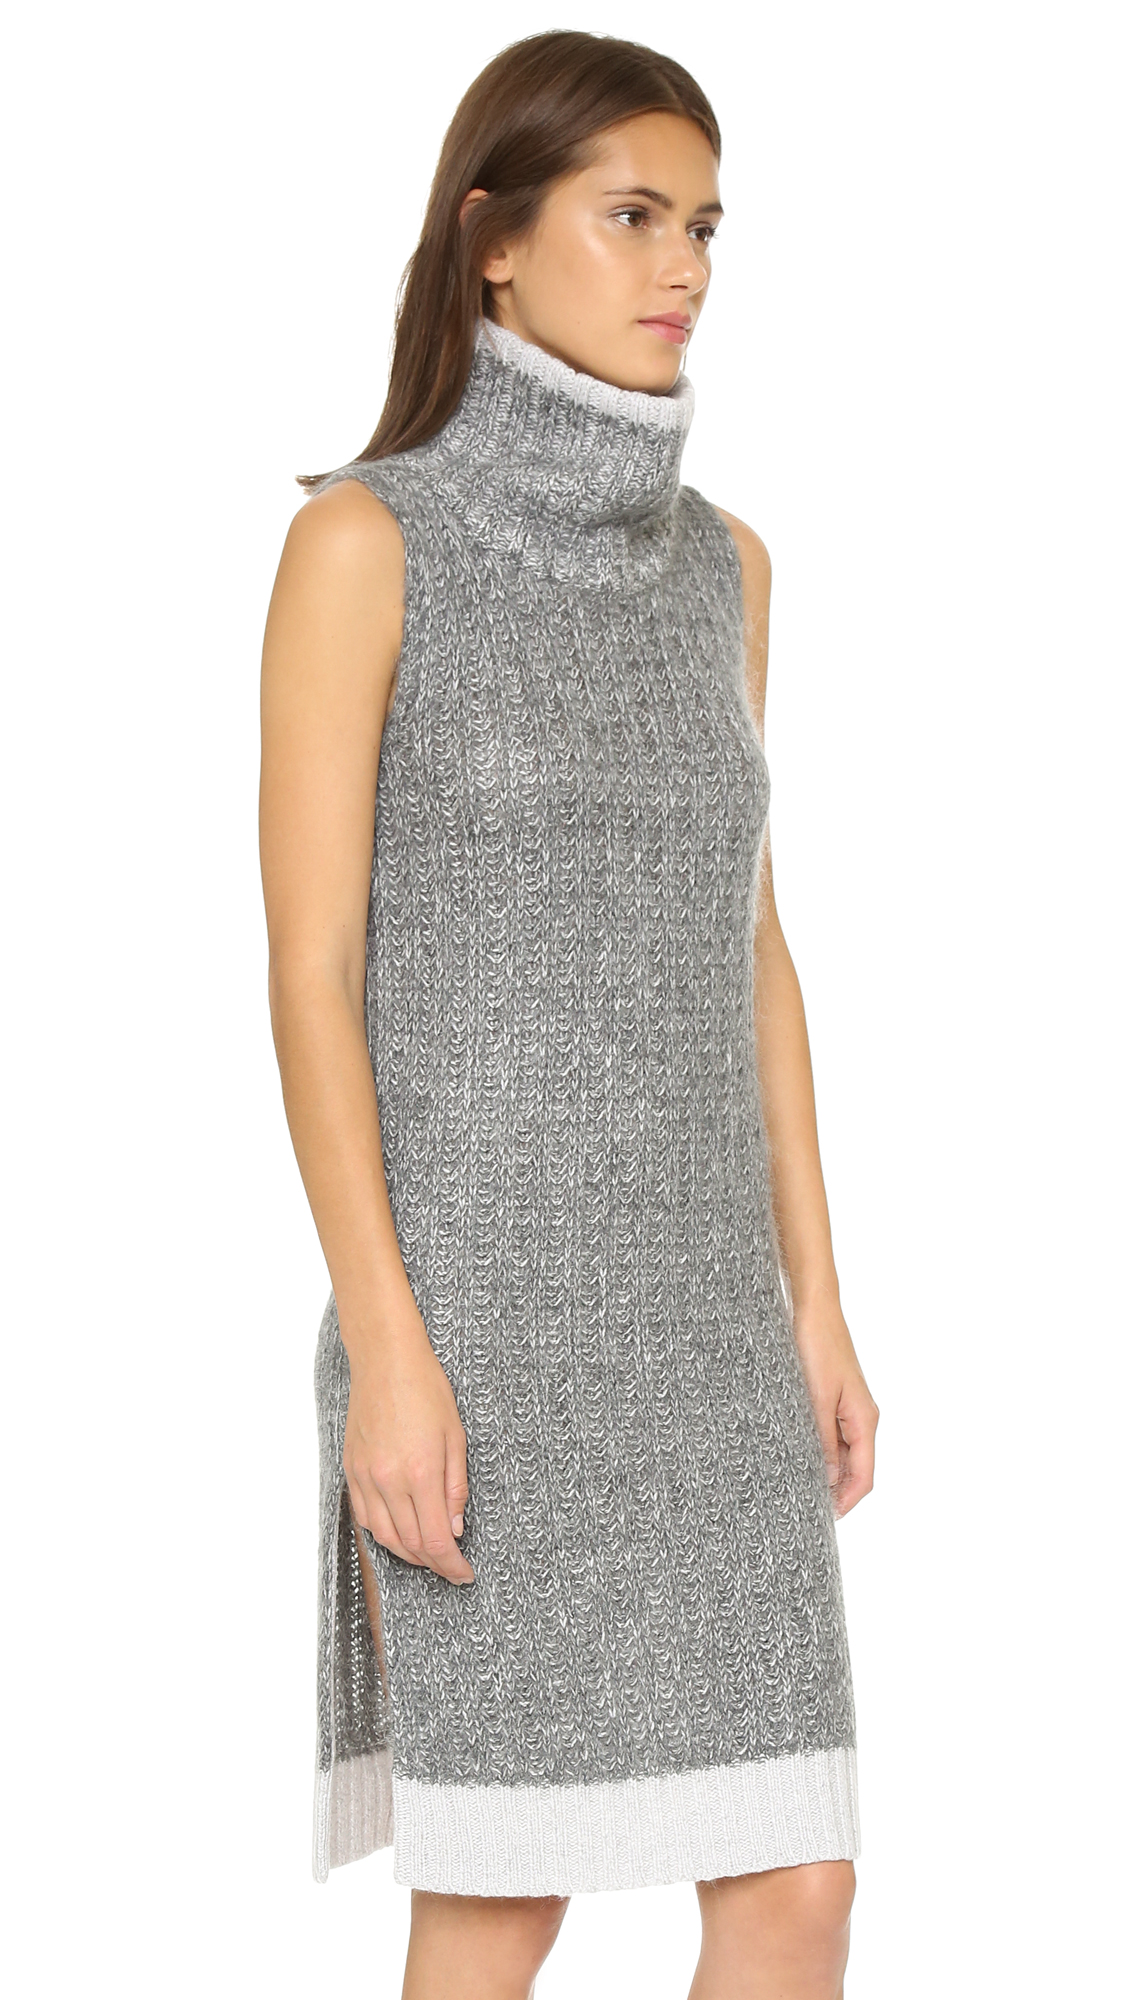 6480201c1d3 Rag   Bone Makenna Sweater Dress